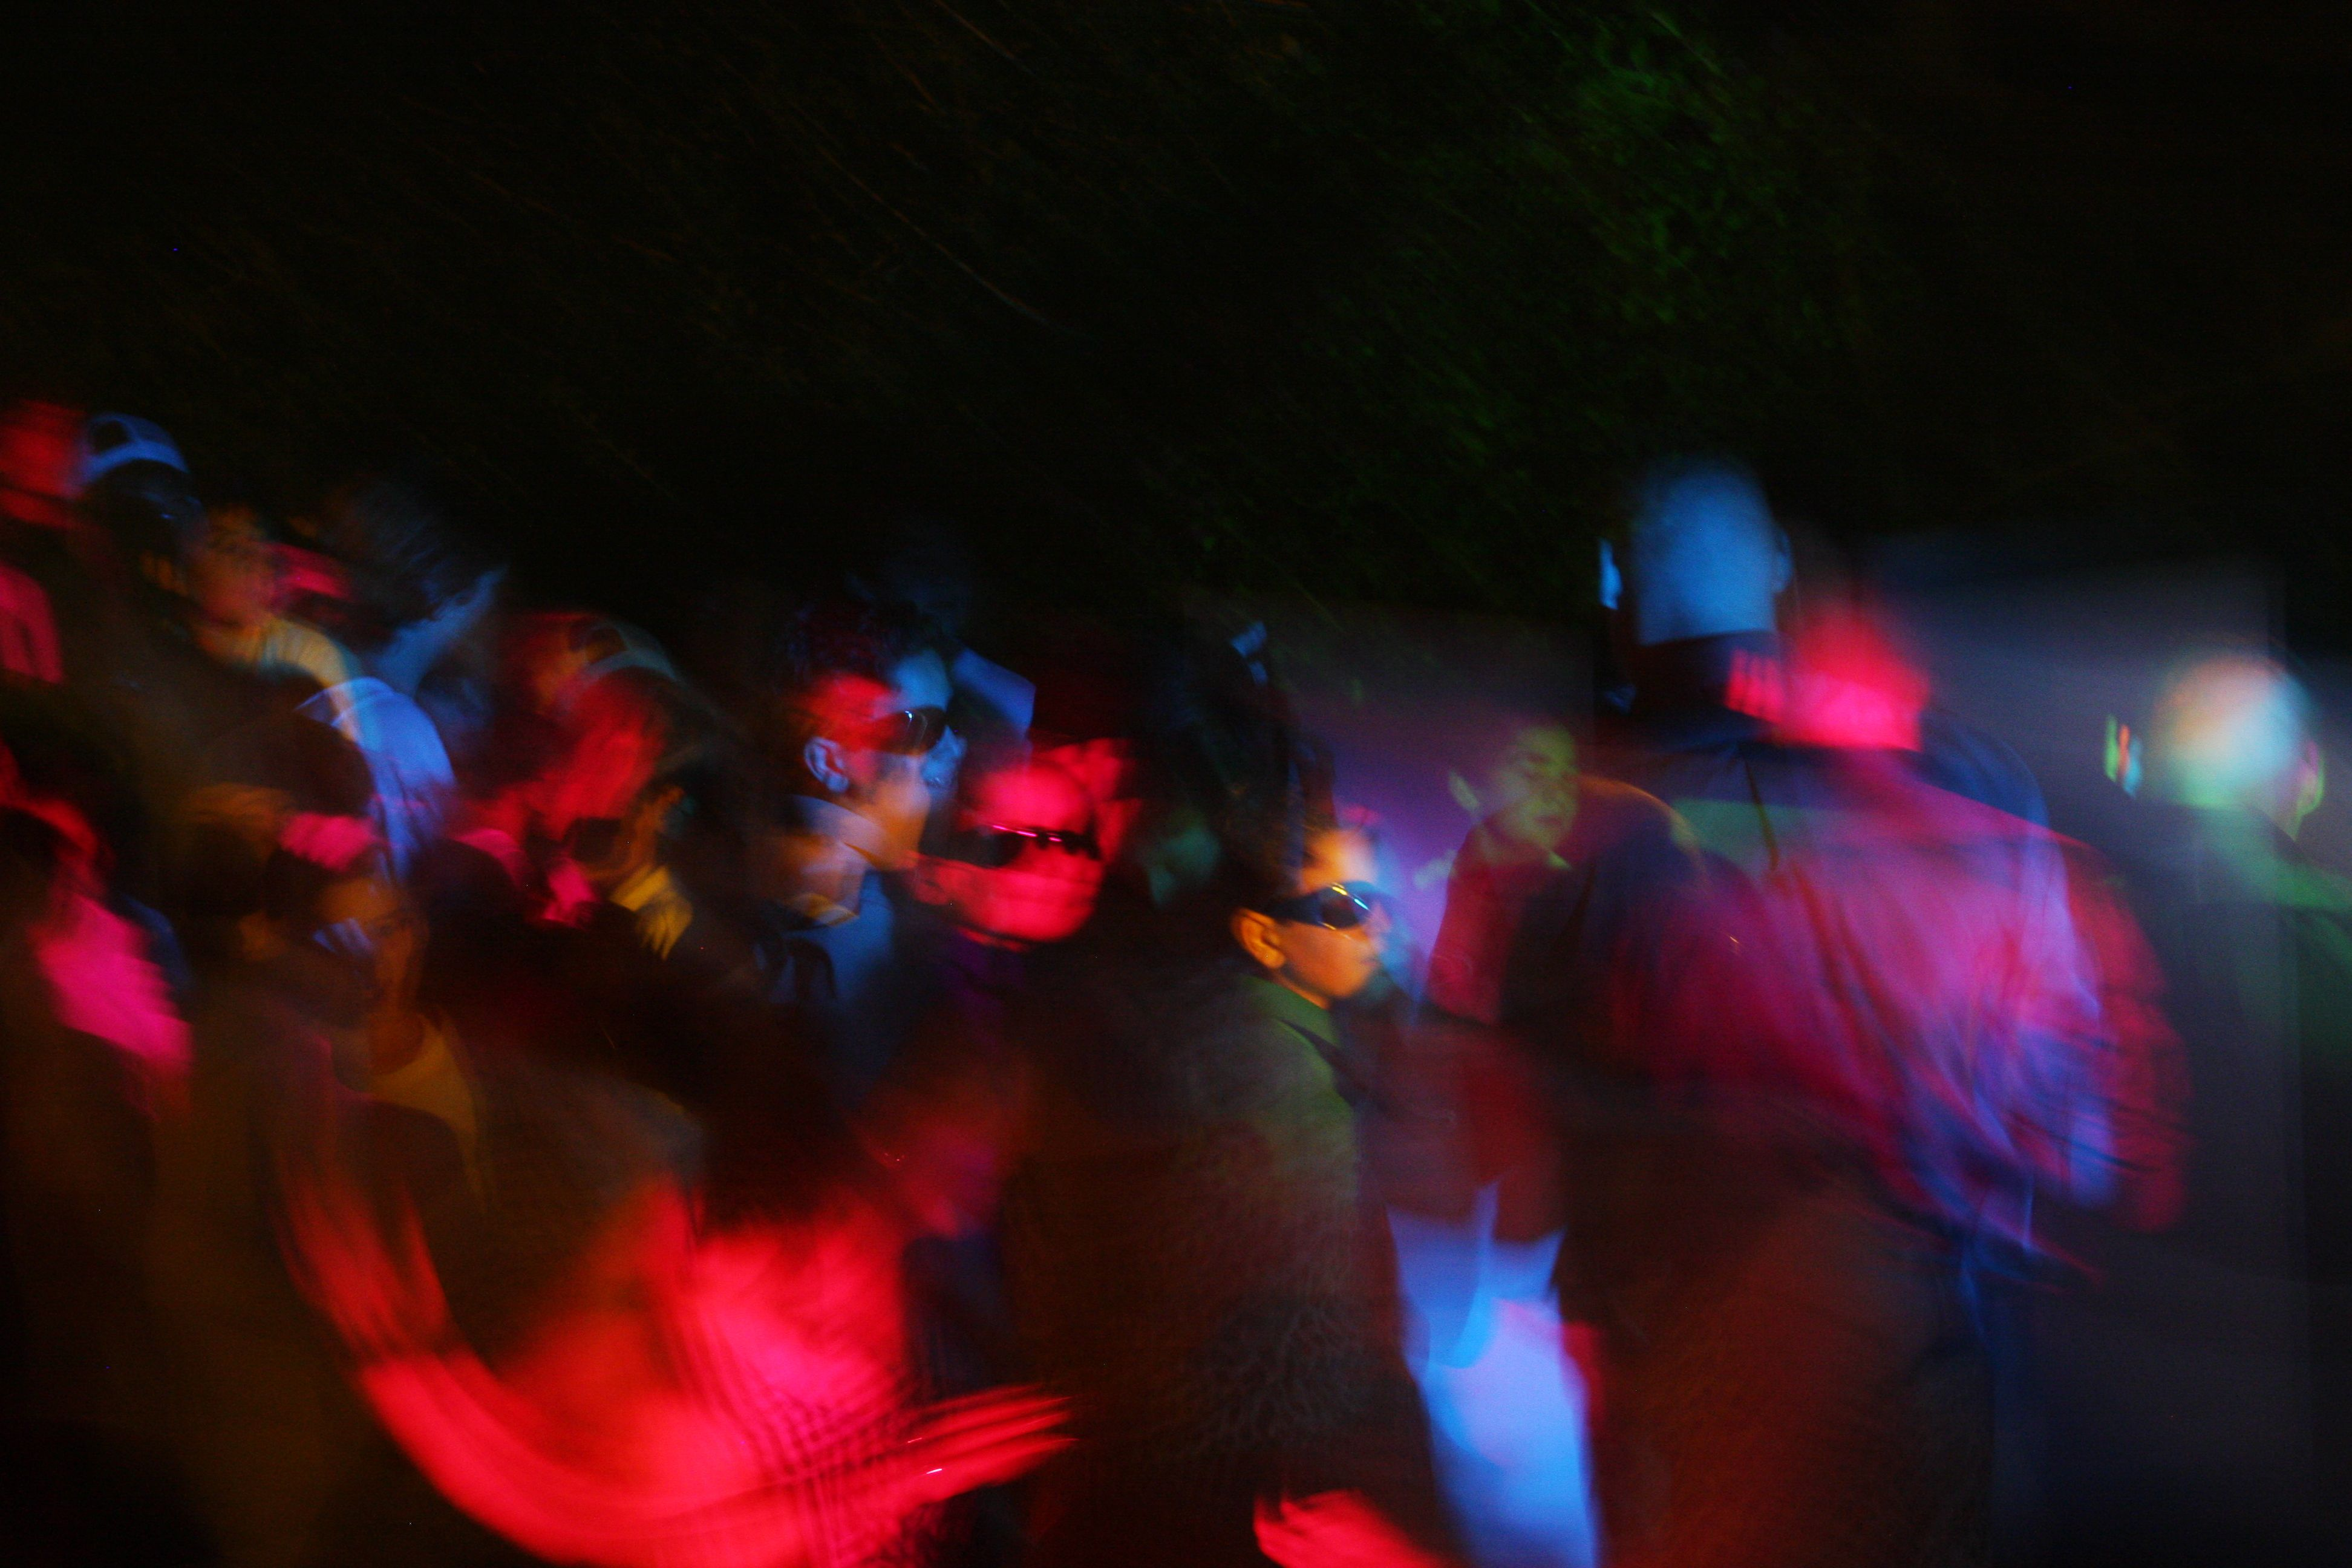 party photography tumblr - Buscar con Google | Infinity ...